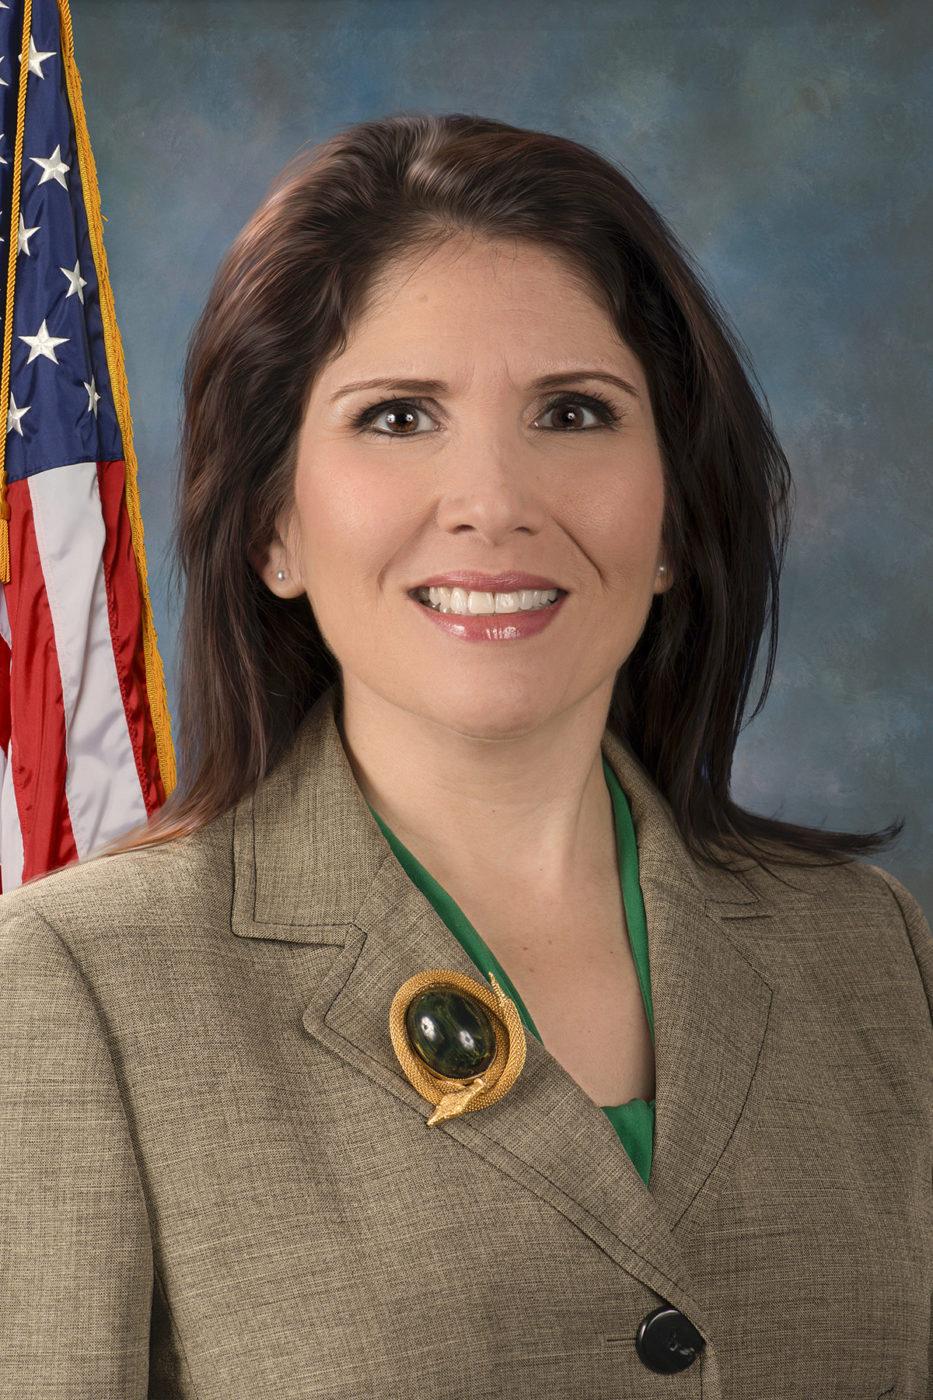 Lieutenant Governor Evelyn Sanguinetti